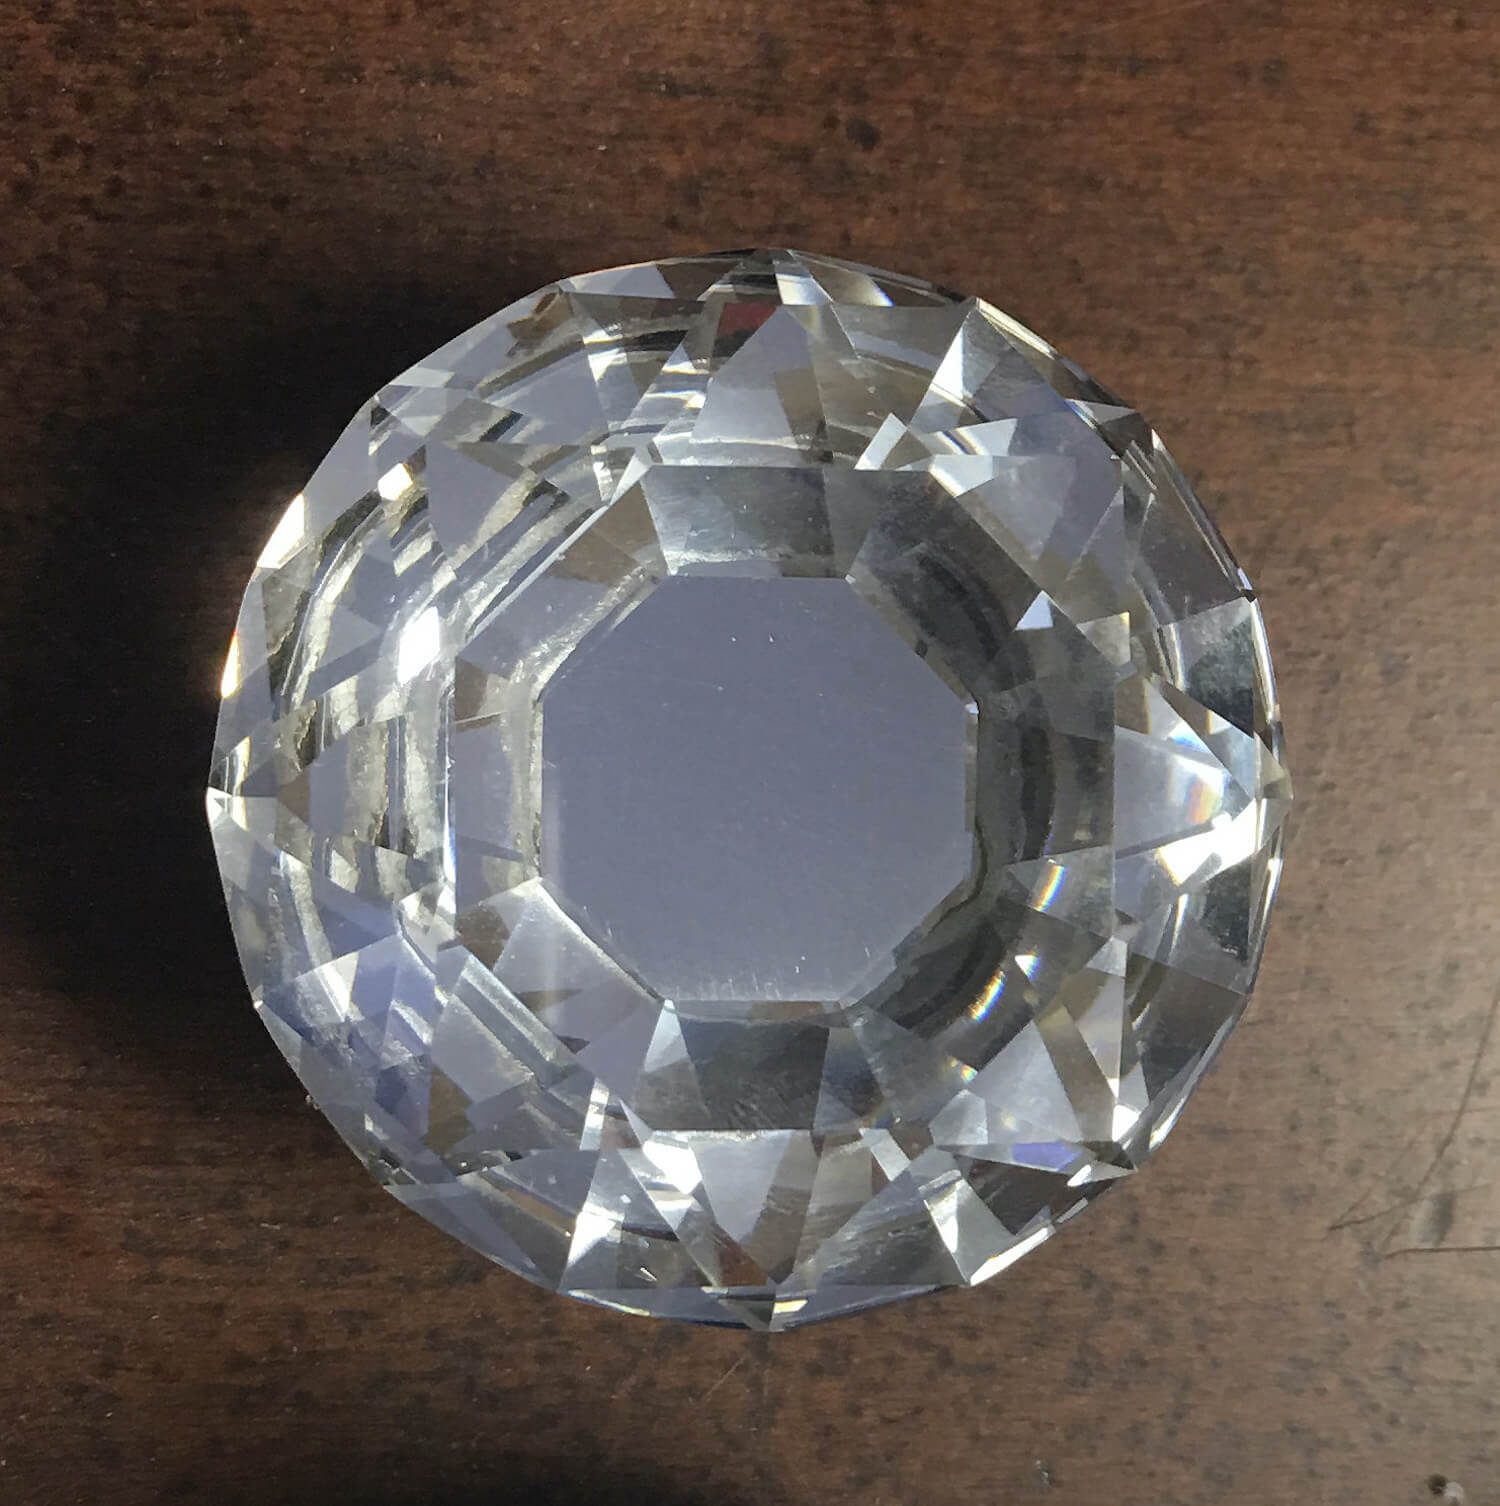 Large Crystal Furniture Or Cabinet Knob